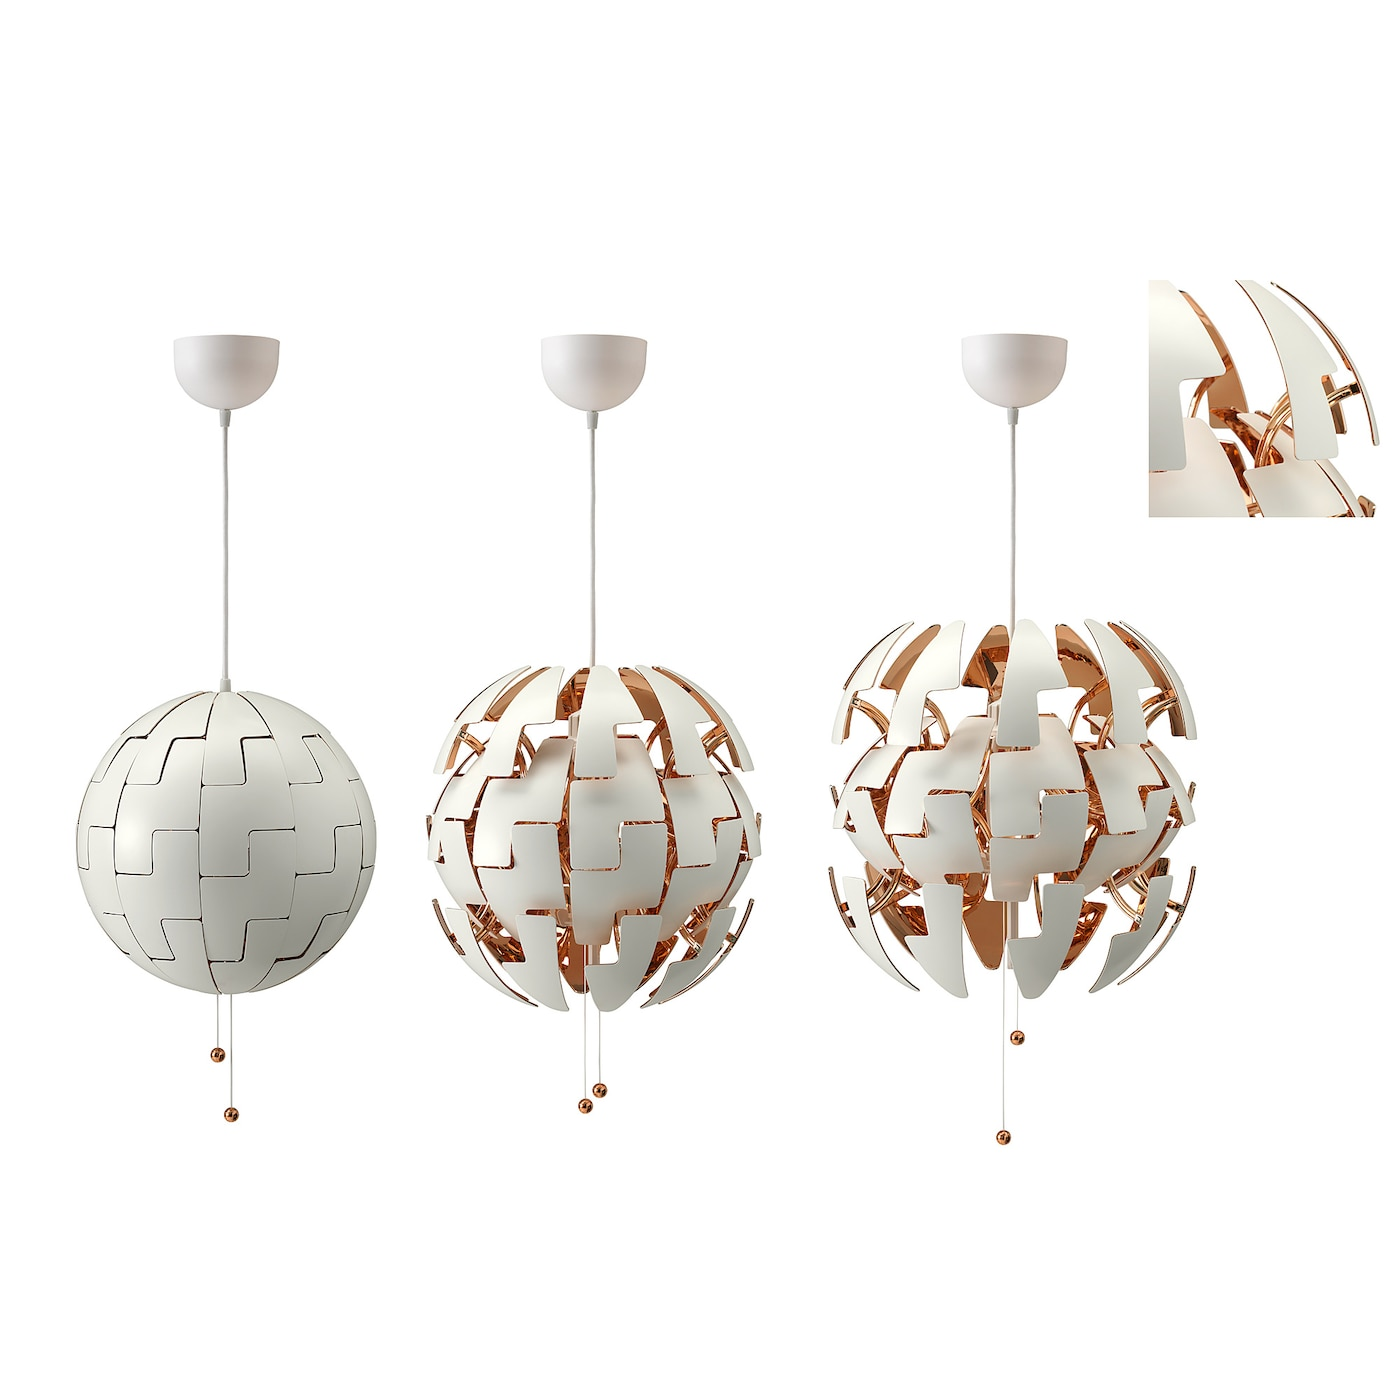 Cartina Mondo Ikea.Megtalaltam Szomszedsag Szarmazik Madzagos Mennyezeti Lampa Strathdonholidaycottage Co Uk